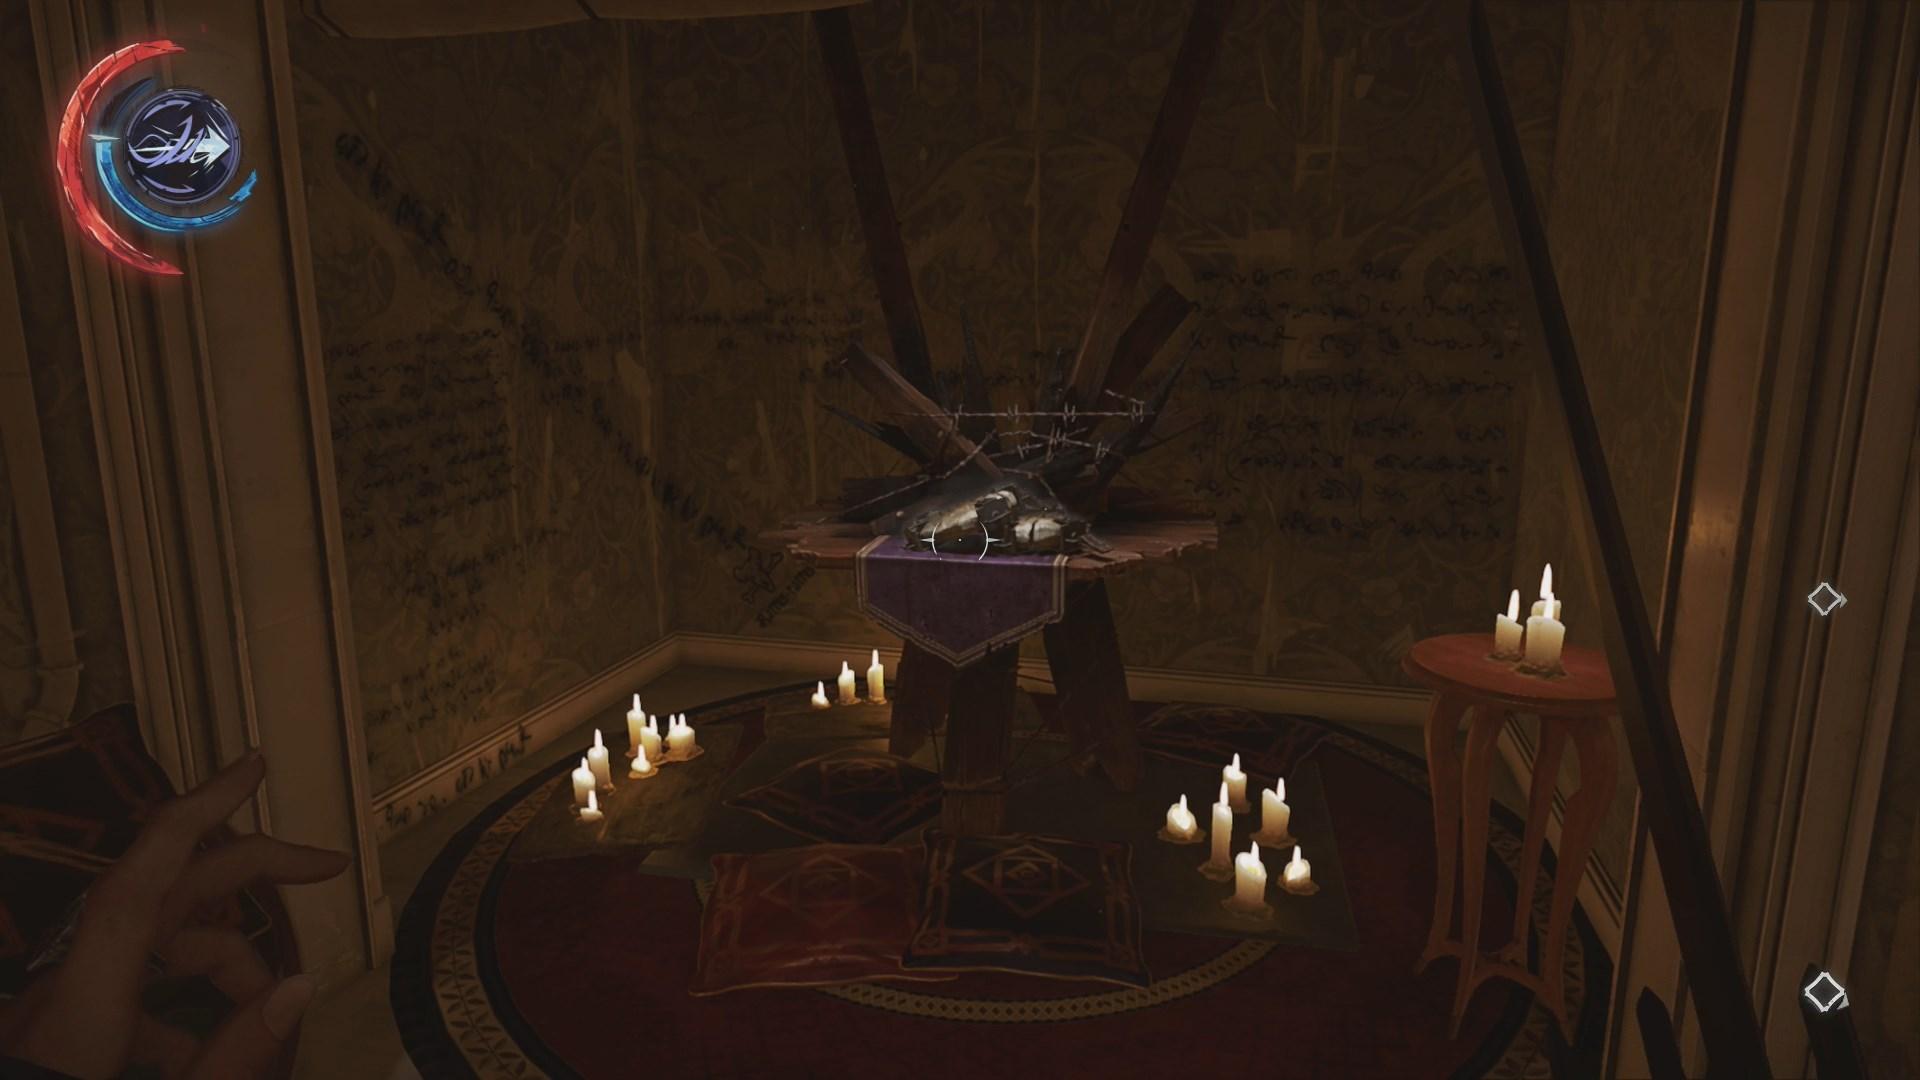 Dishonored 2 Mission 6 Shrine #1